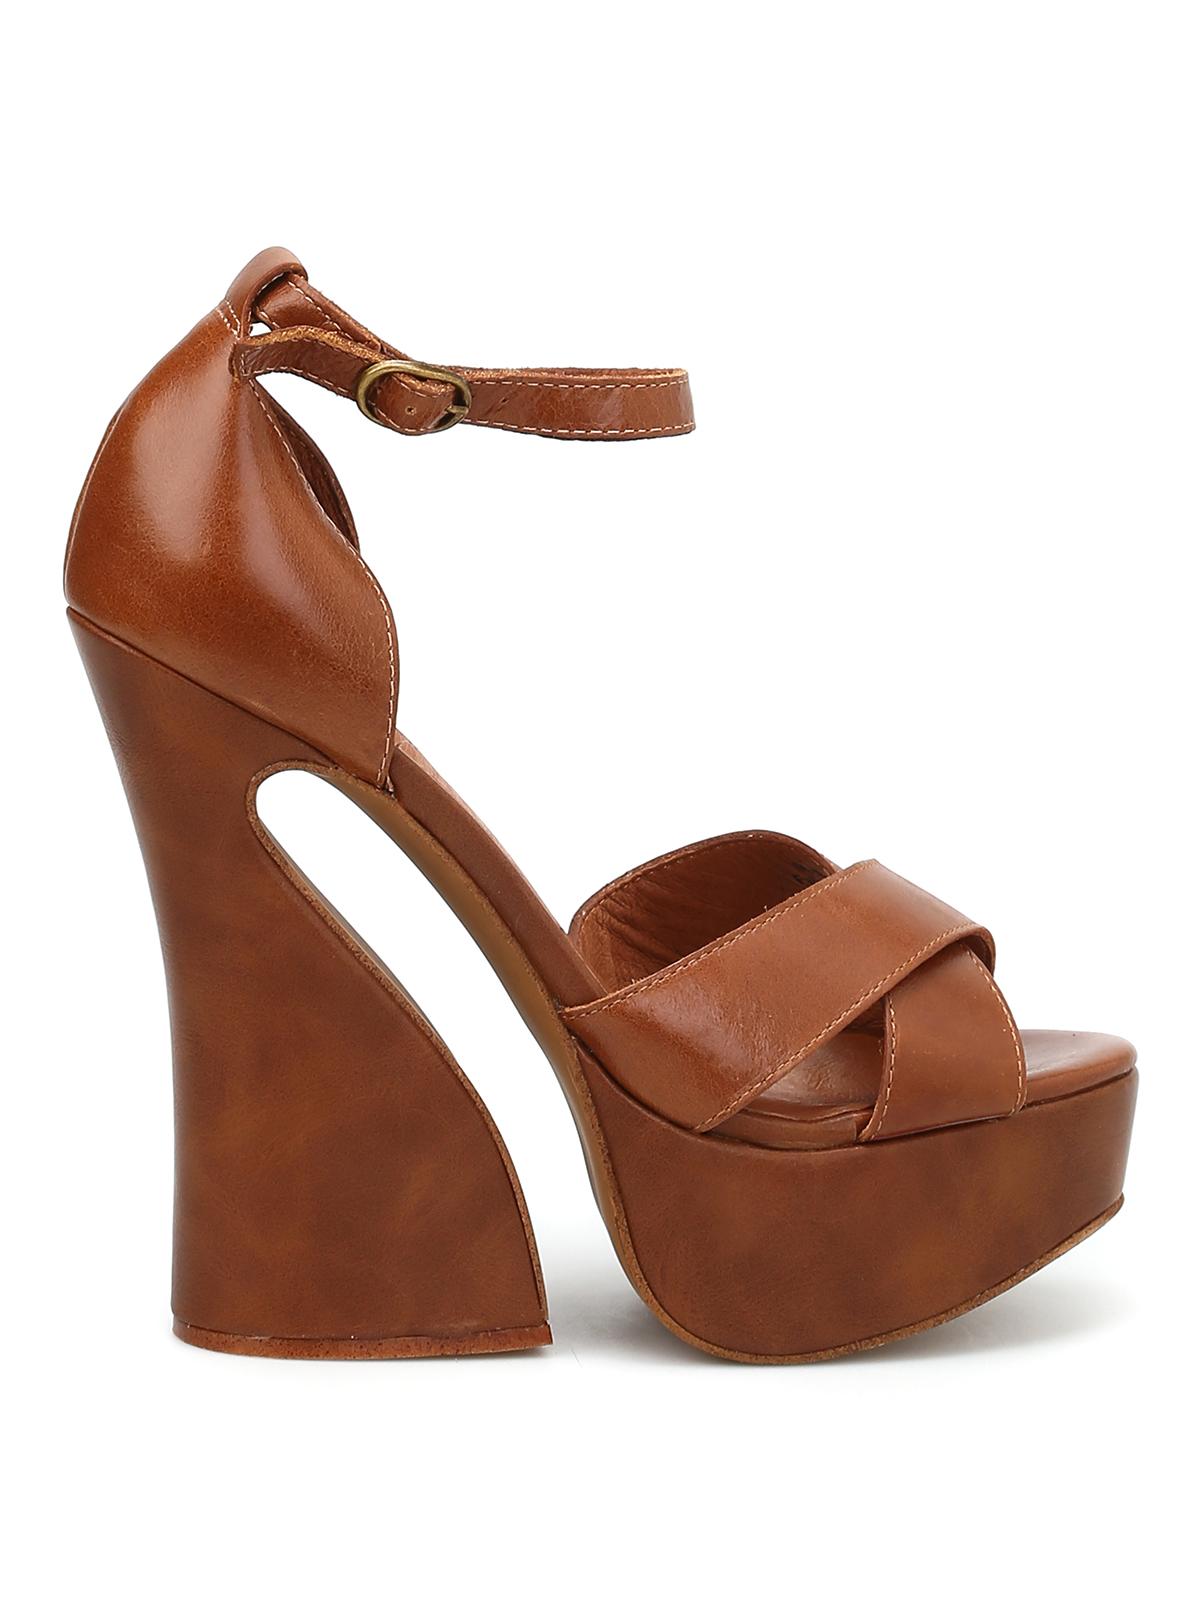 0187ae7c66c8 Jeffrey Campbell - Stefanya sandals - sandals - STEFANYA 29JC055